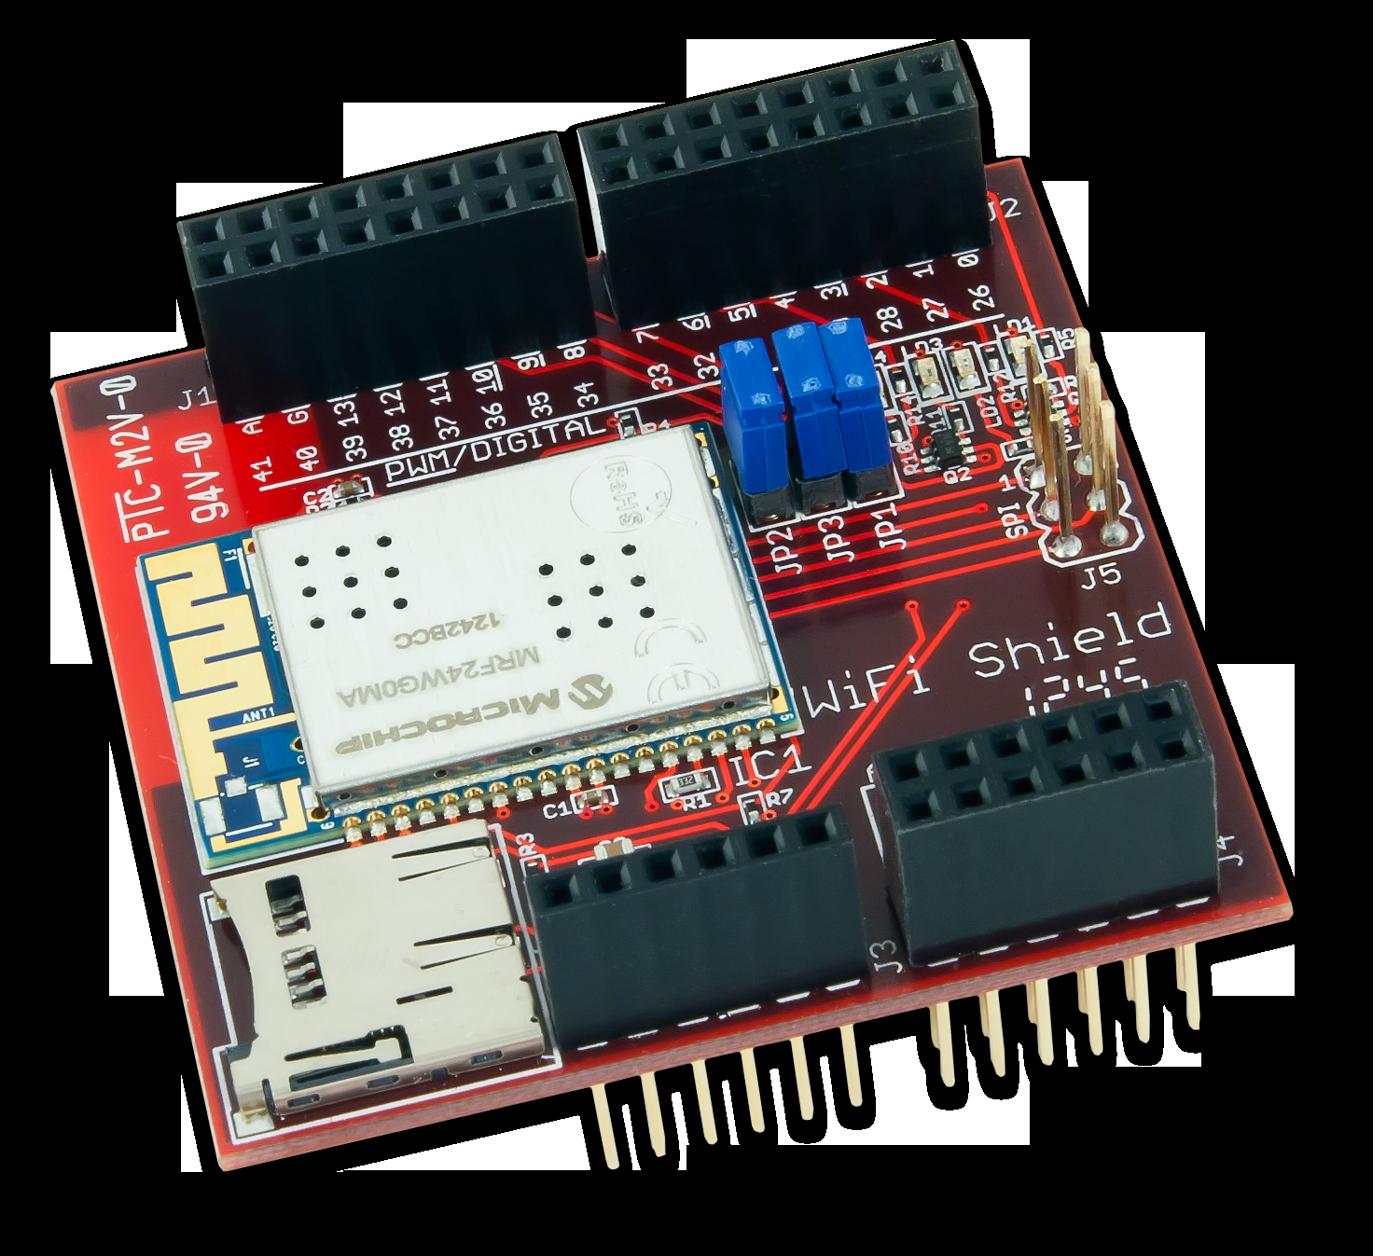 chipkit_shield_wifi:chipkit-wifi-shield-g-obl-1400.png